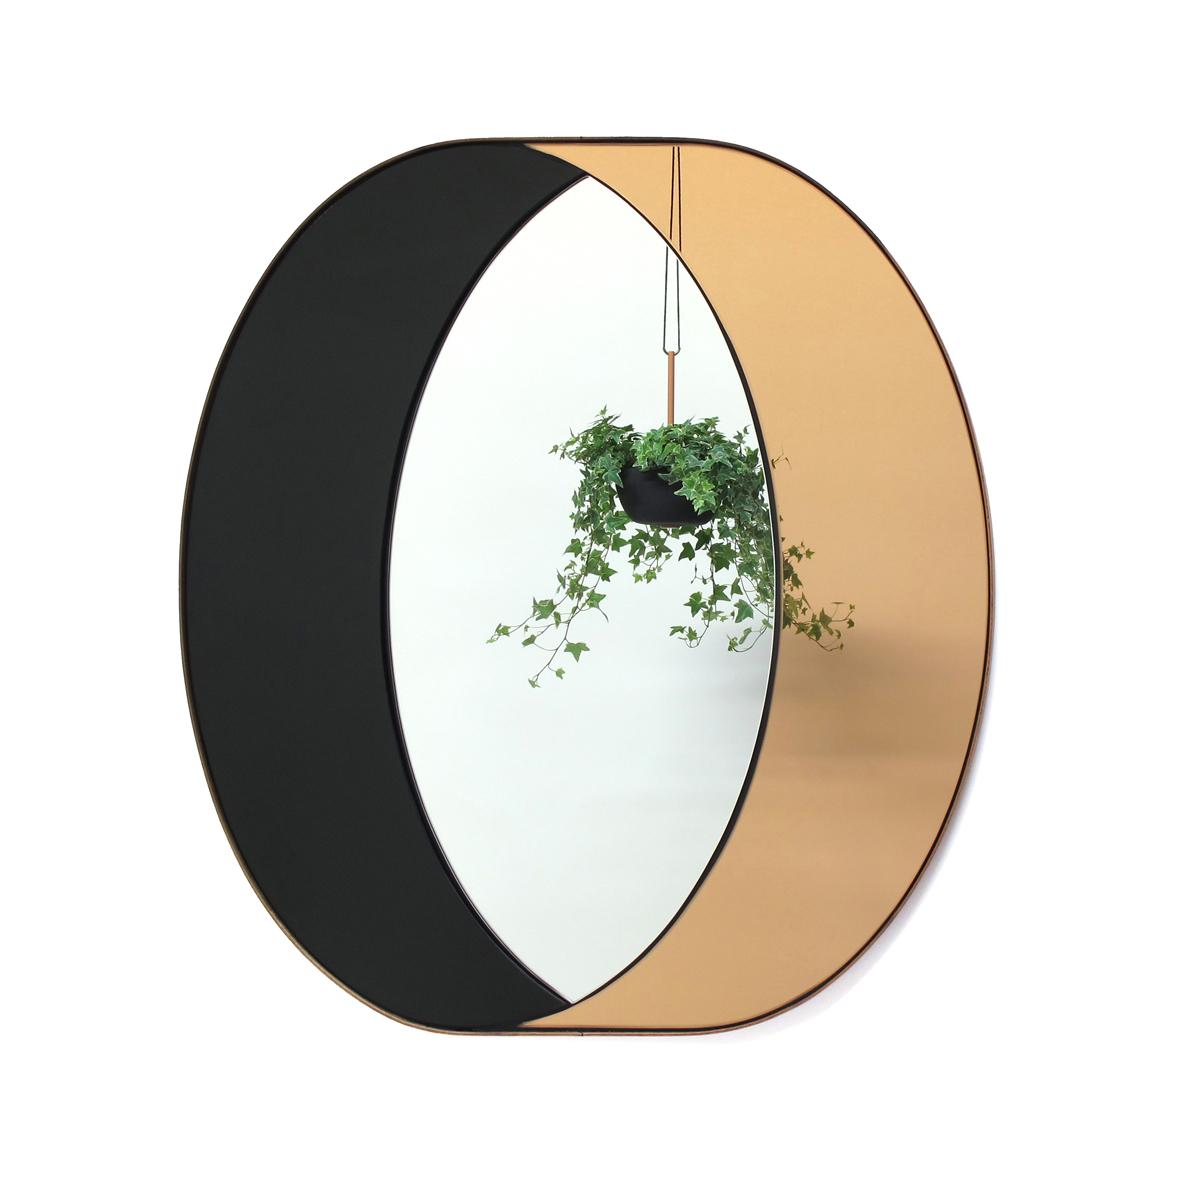 Ring Mirror, $1,500